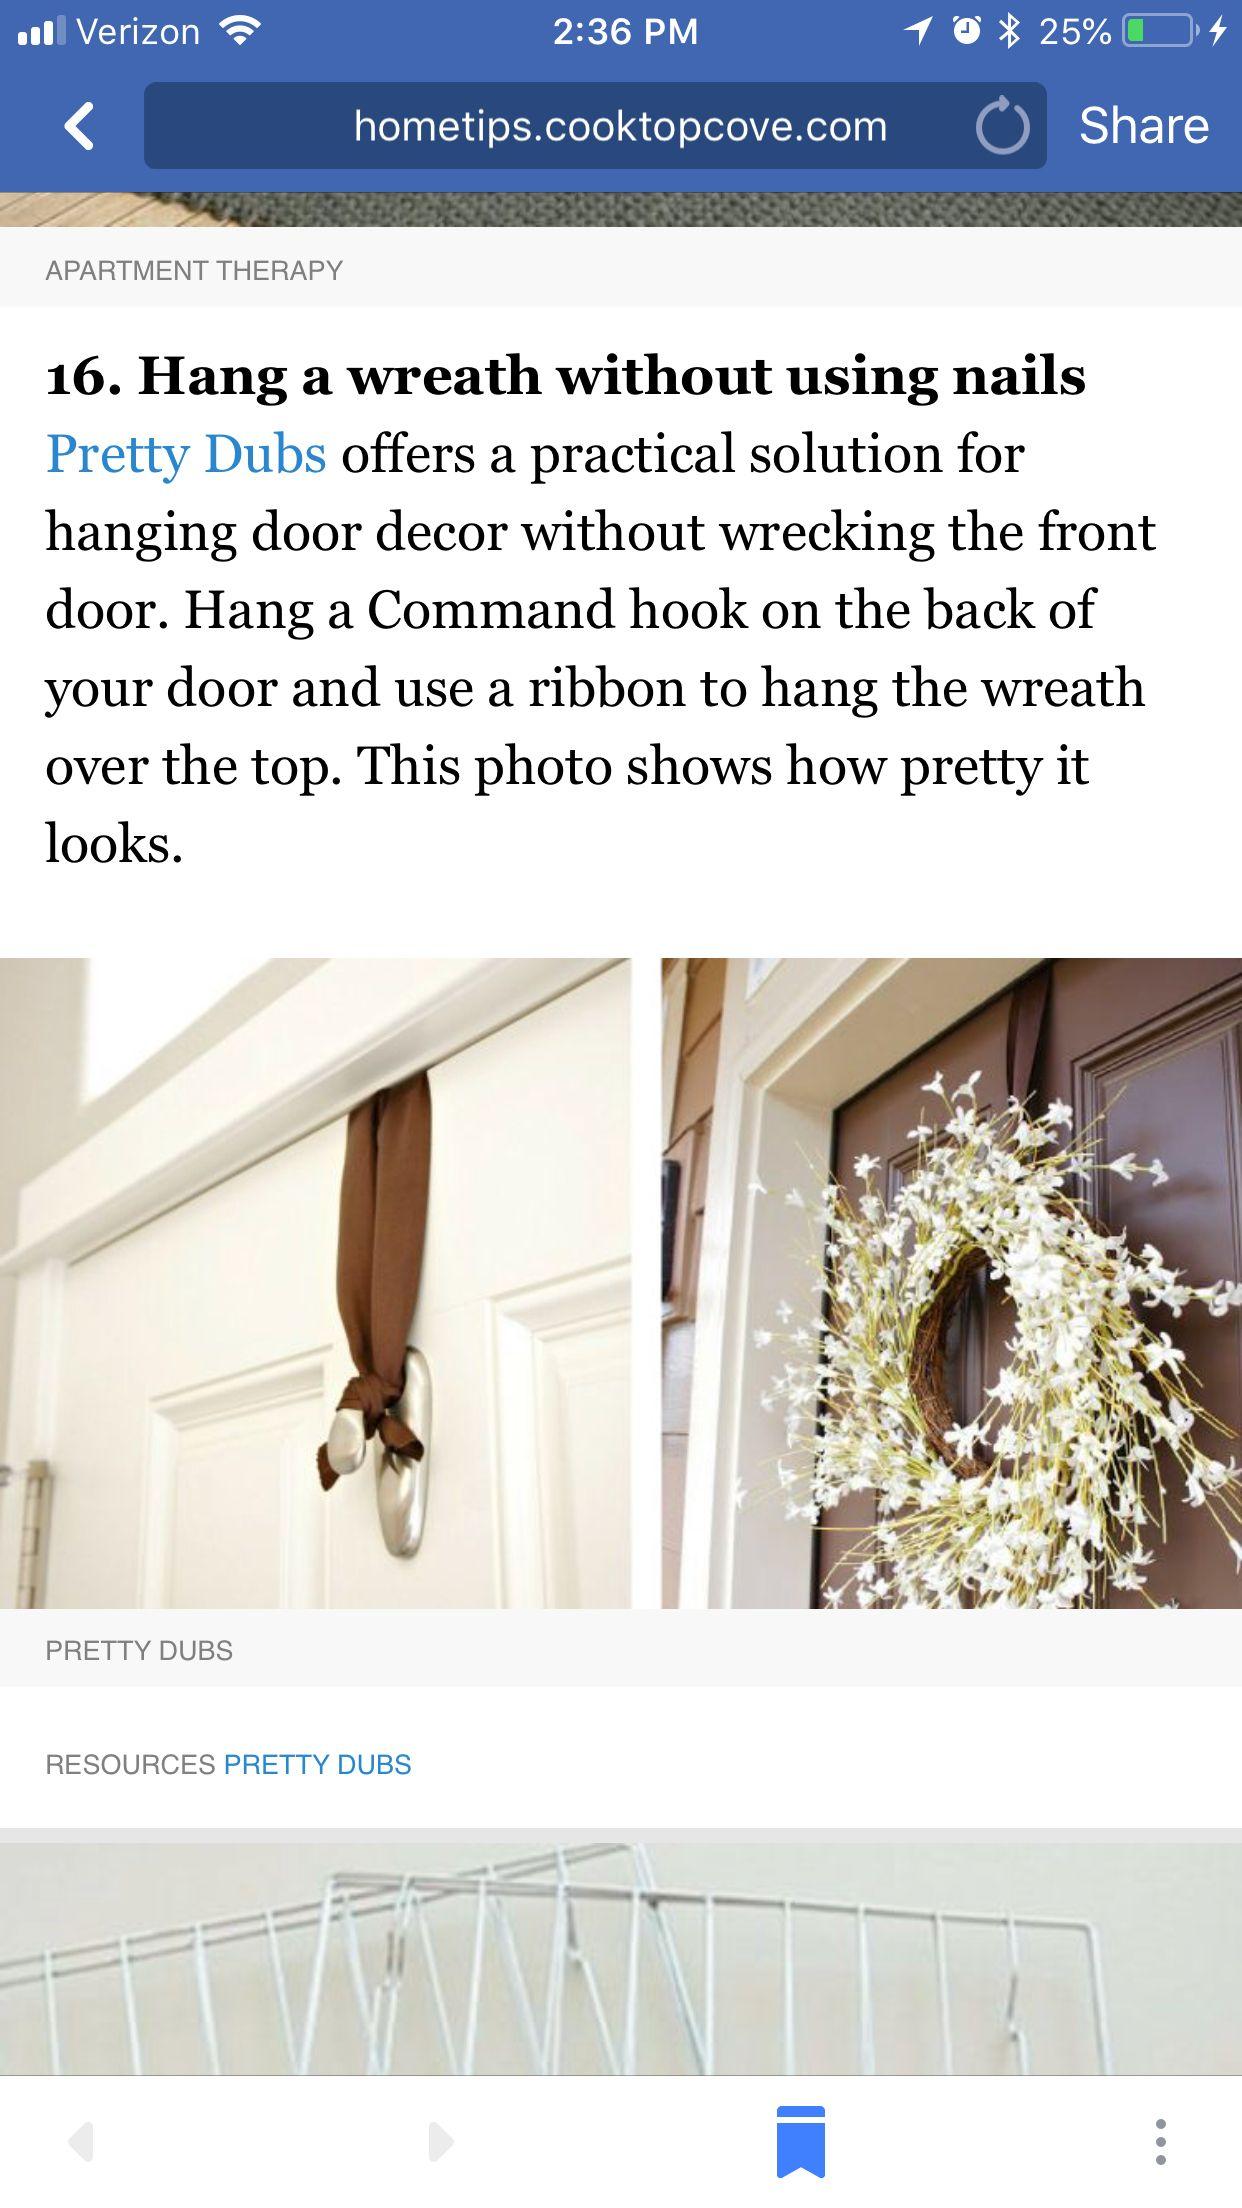 Door decorations image by Sondra McIntosh on Houehold ...